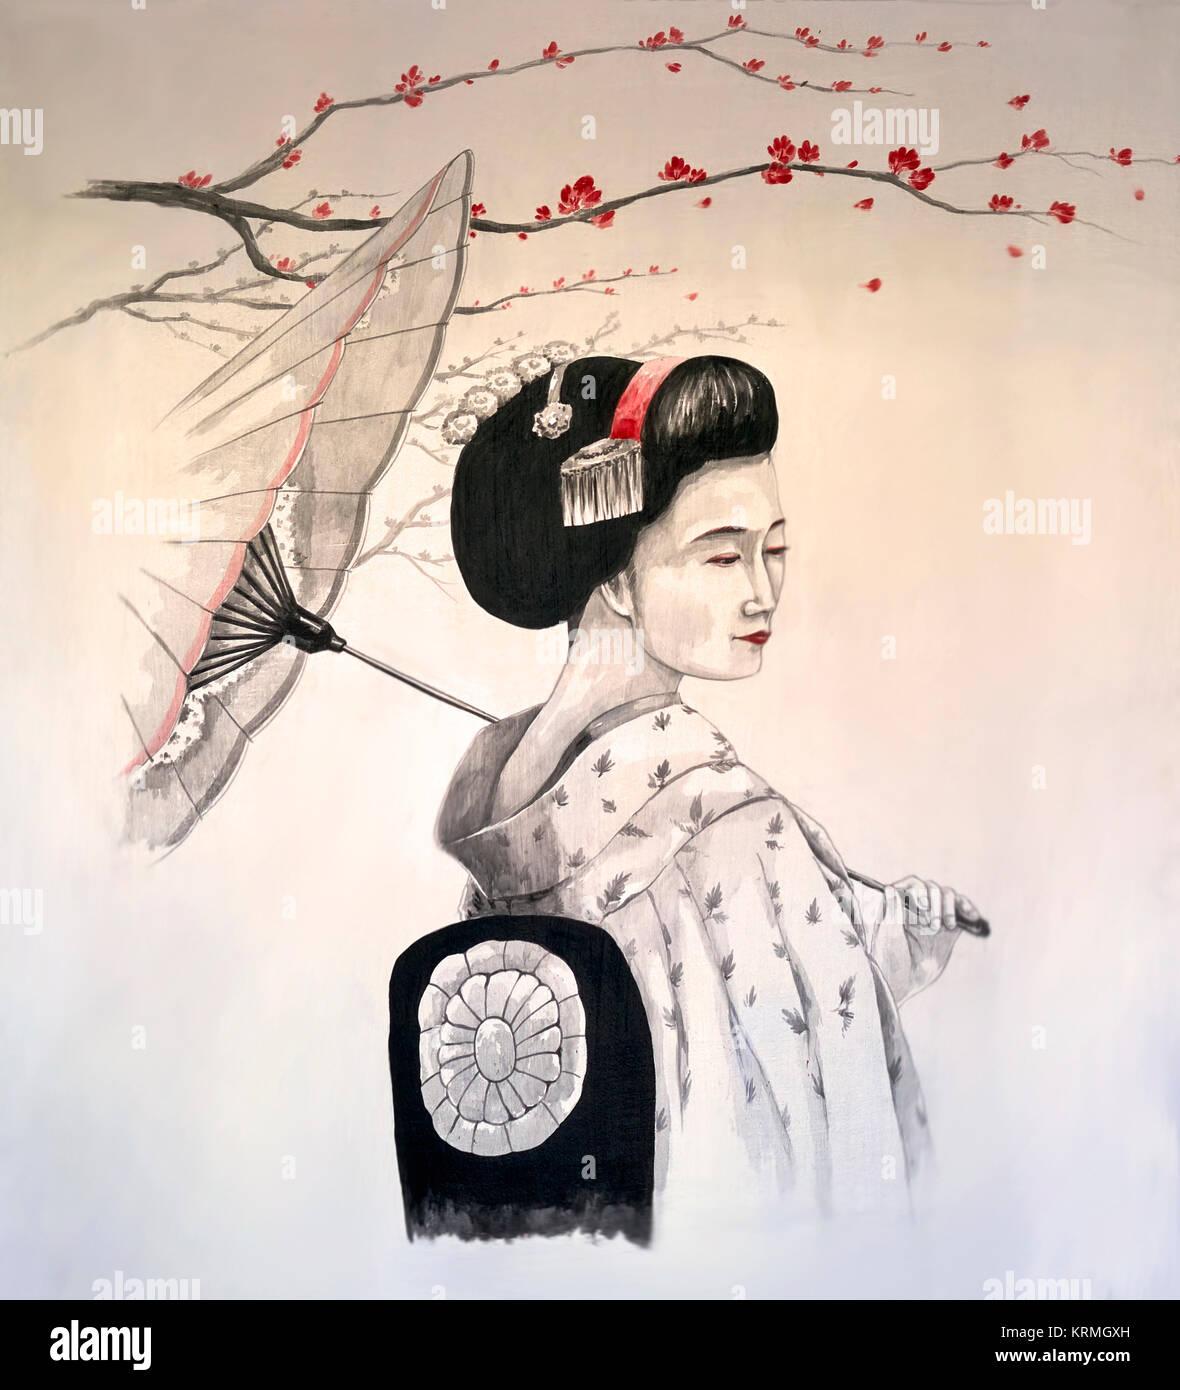 japanese-geisha-art-wall-art-of-a-geisha